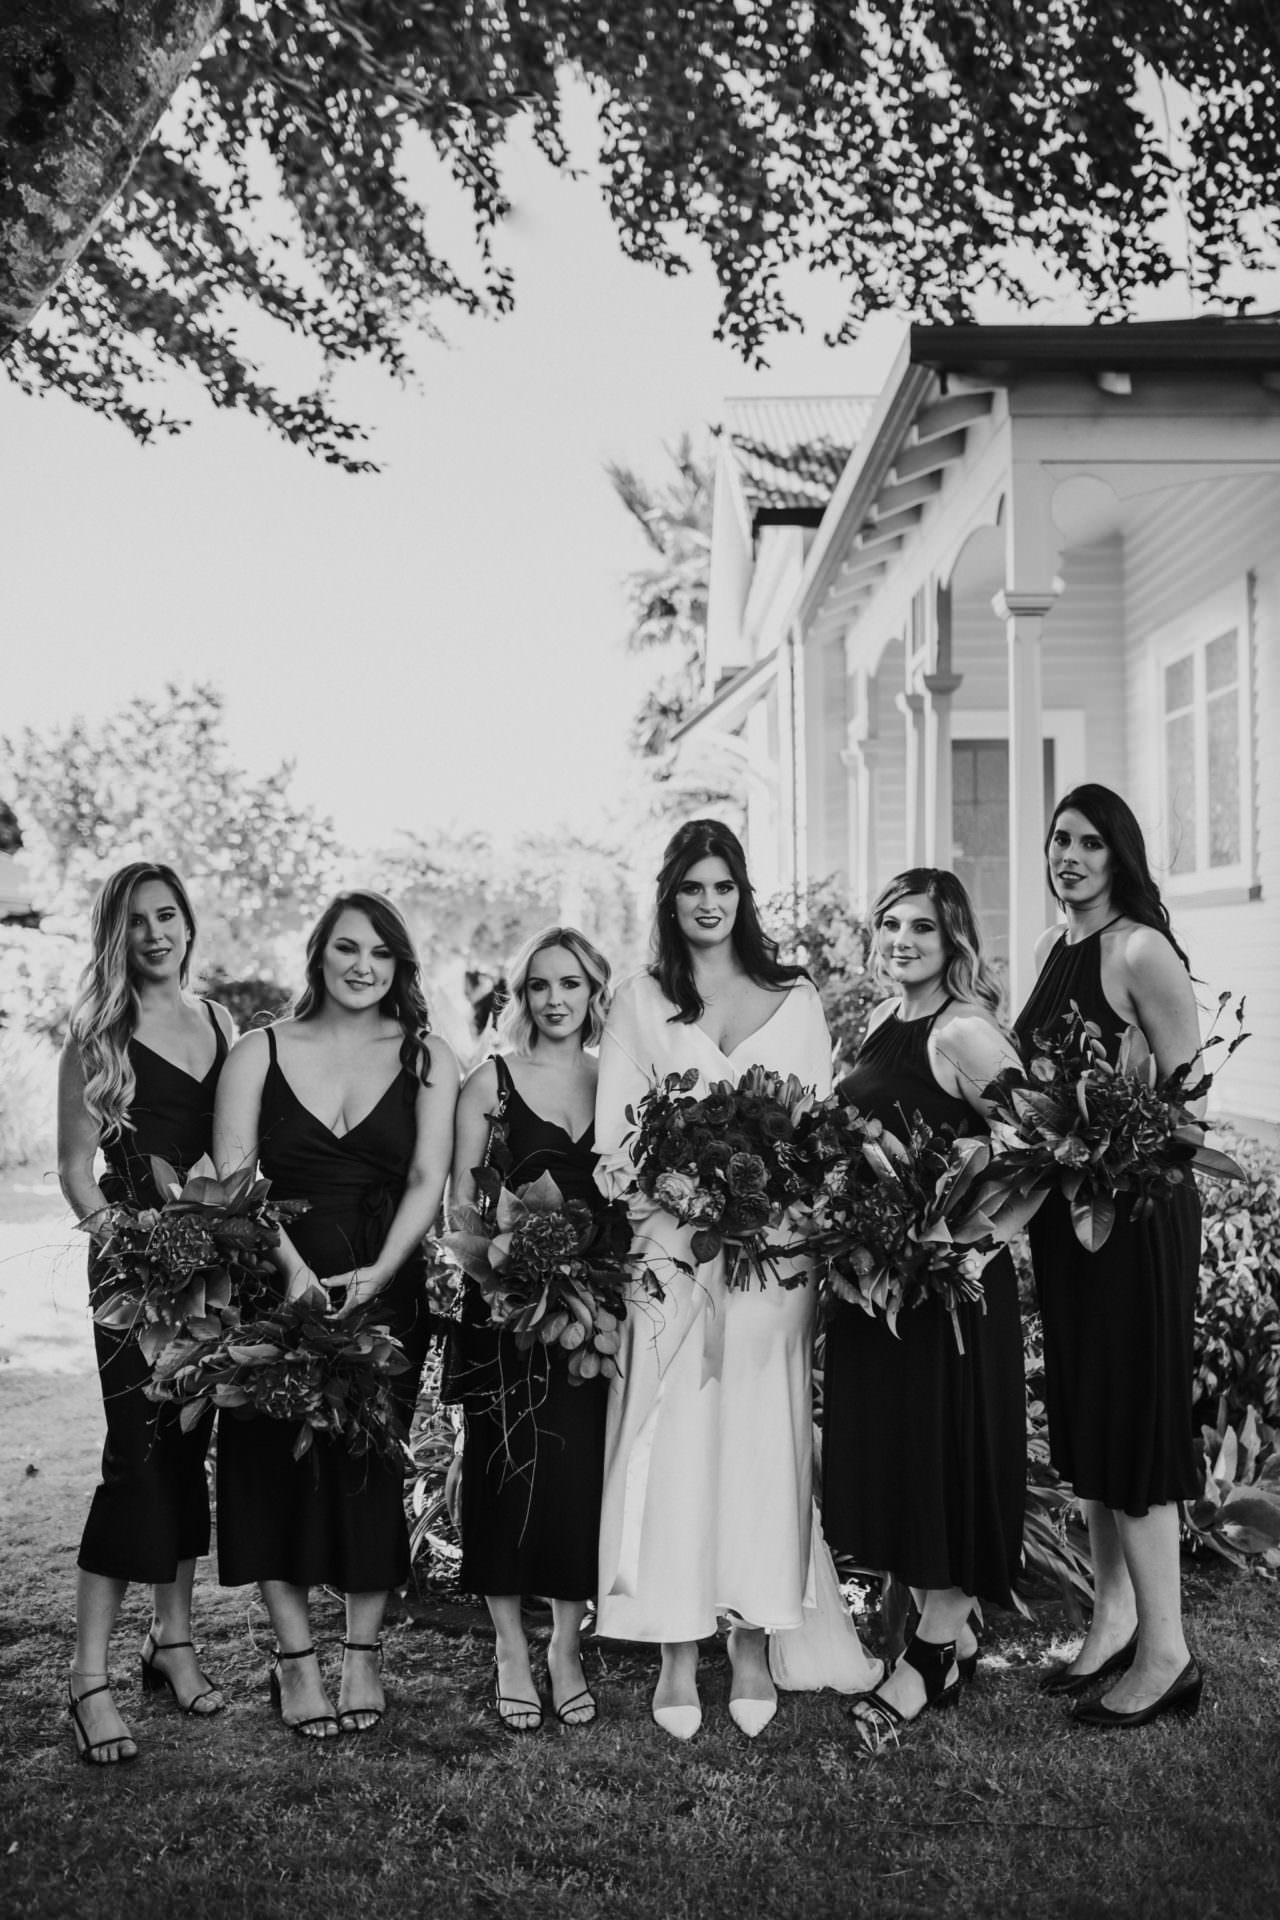 Bride and Bridesmaids in black dresses